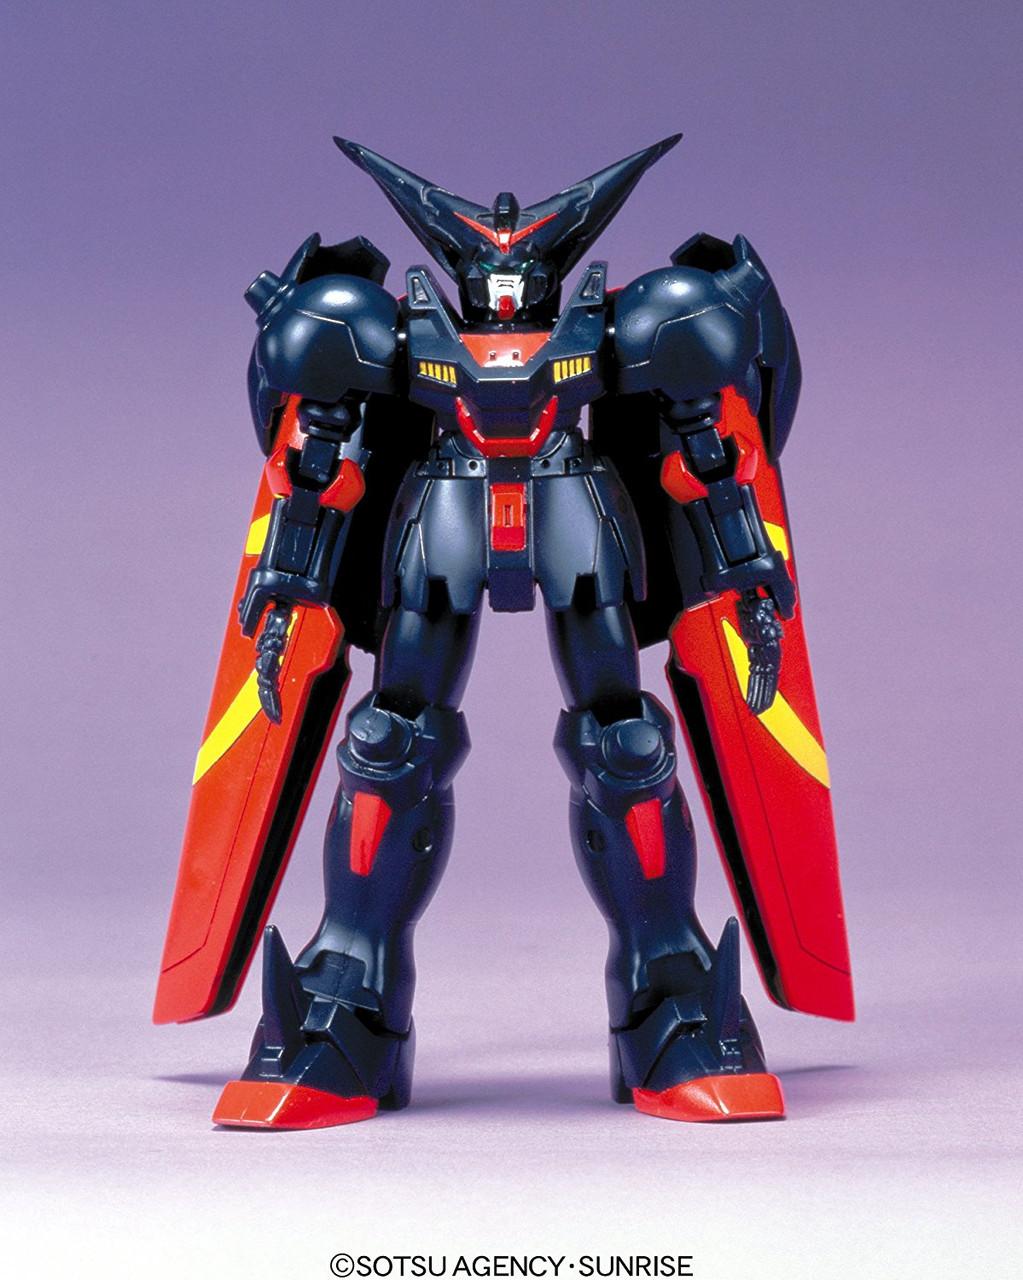 Bandai G Gundam Master Gundam 1 144 Scale Kit Plazajapan